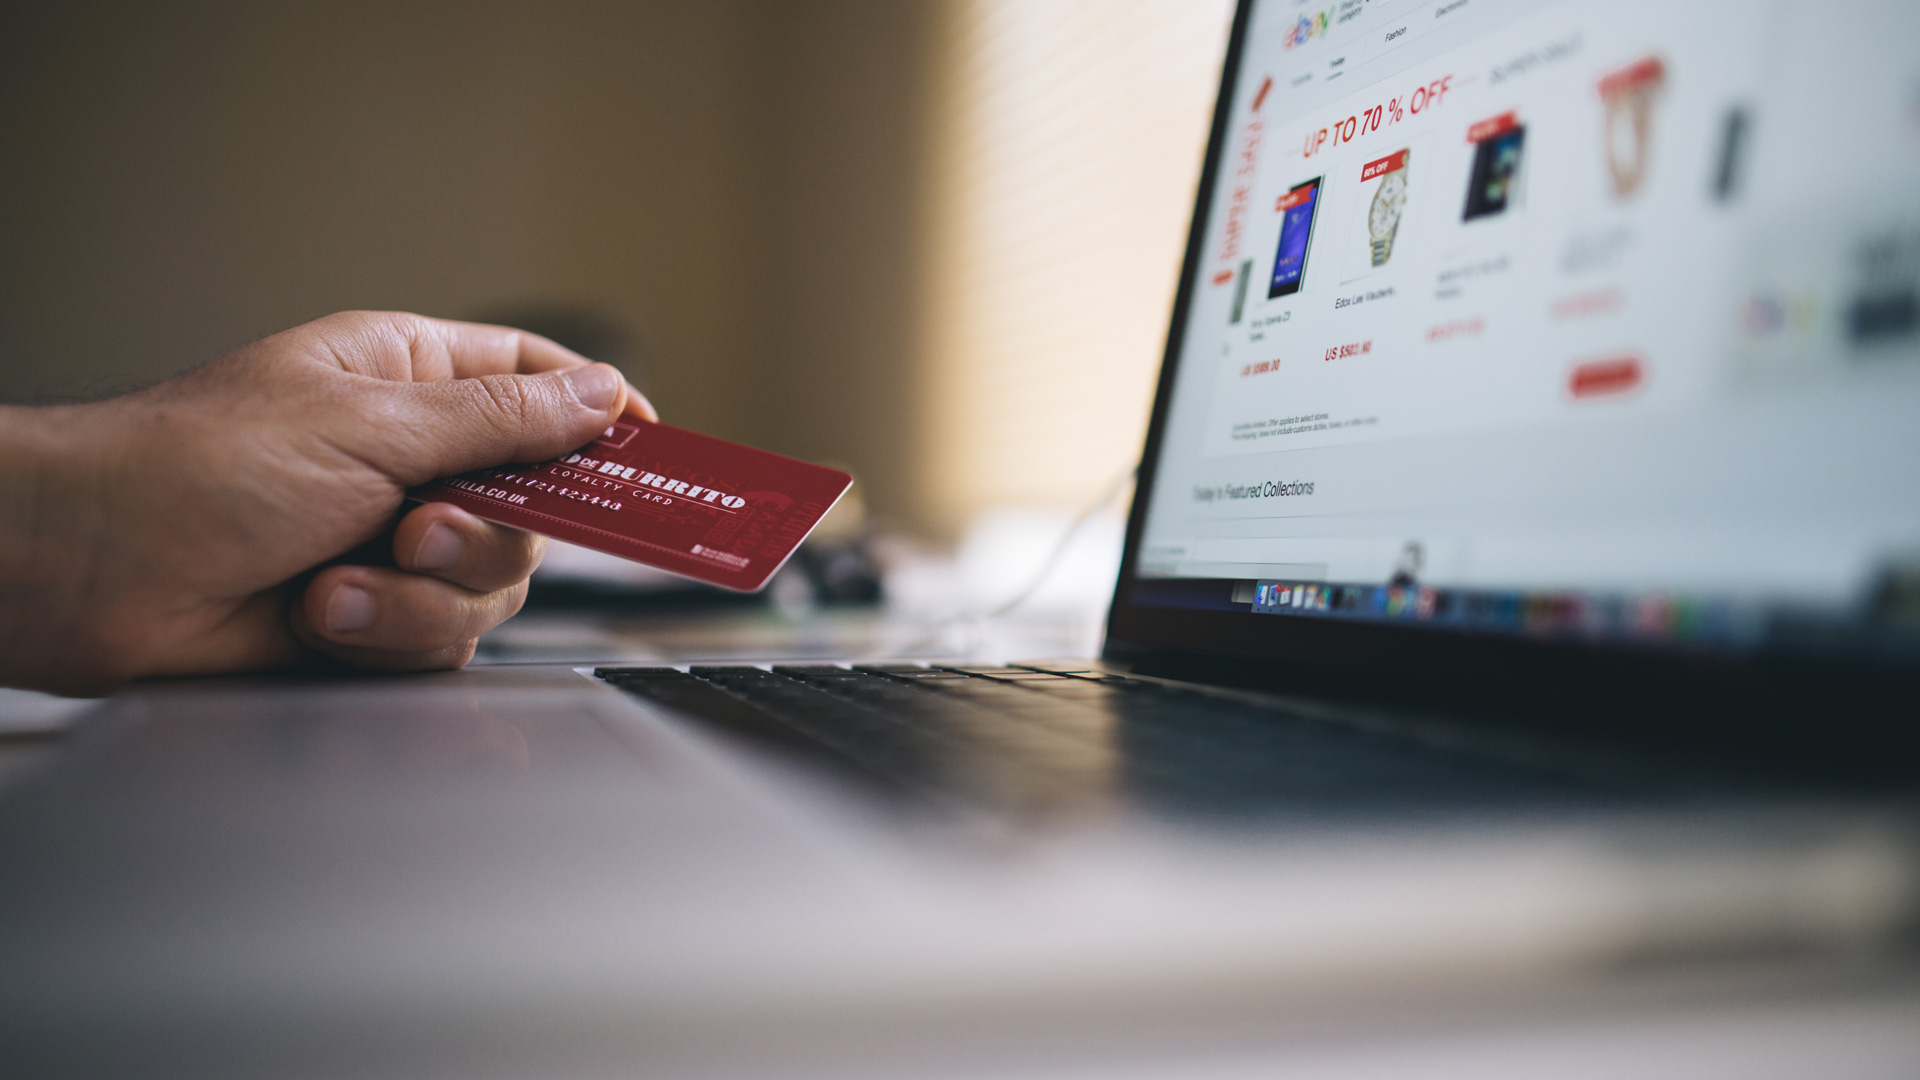 Online Shopping | Kingsland Linassi | Luxury Resort Marketing